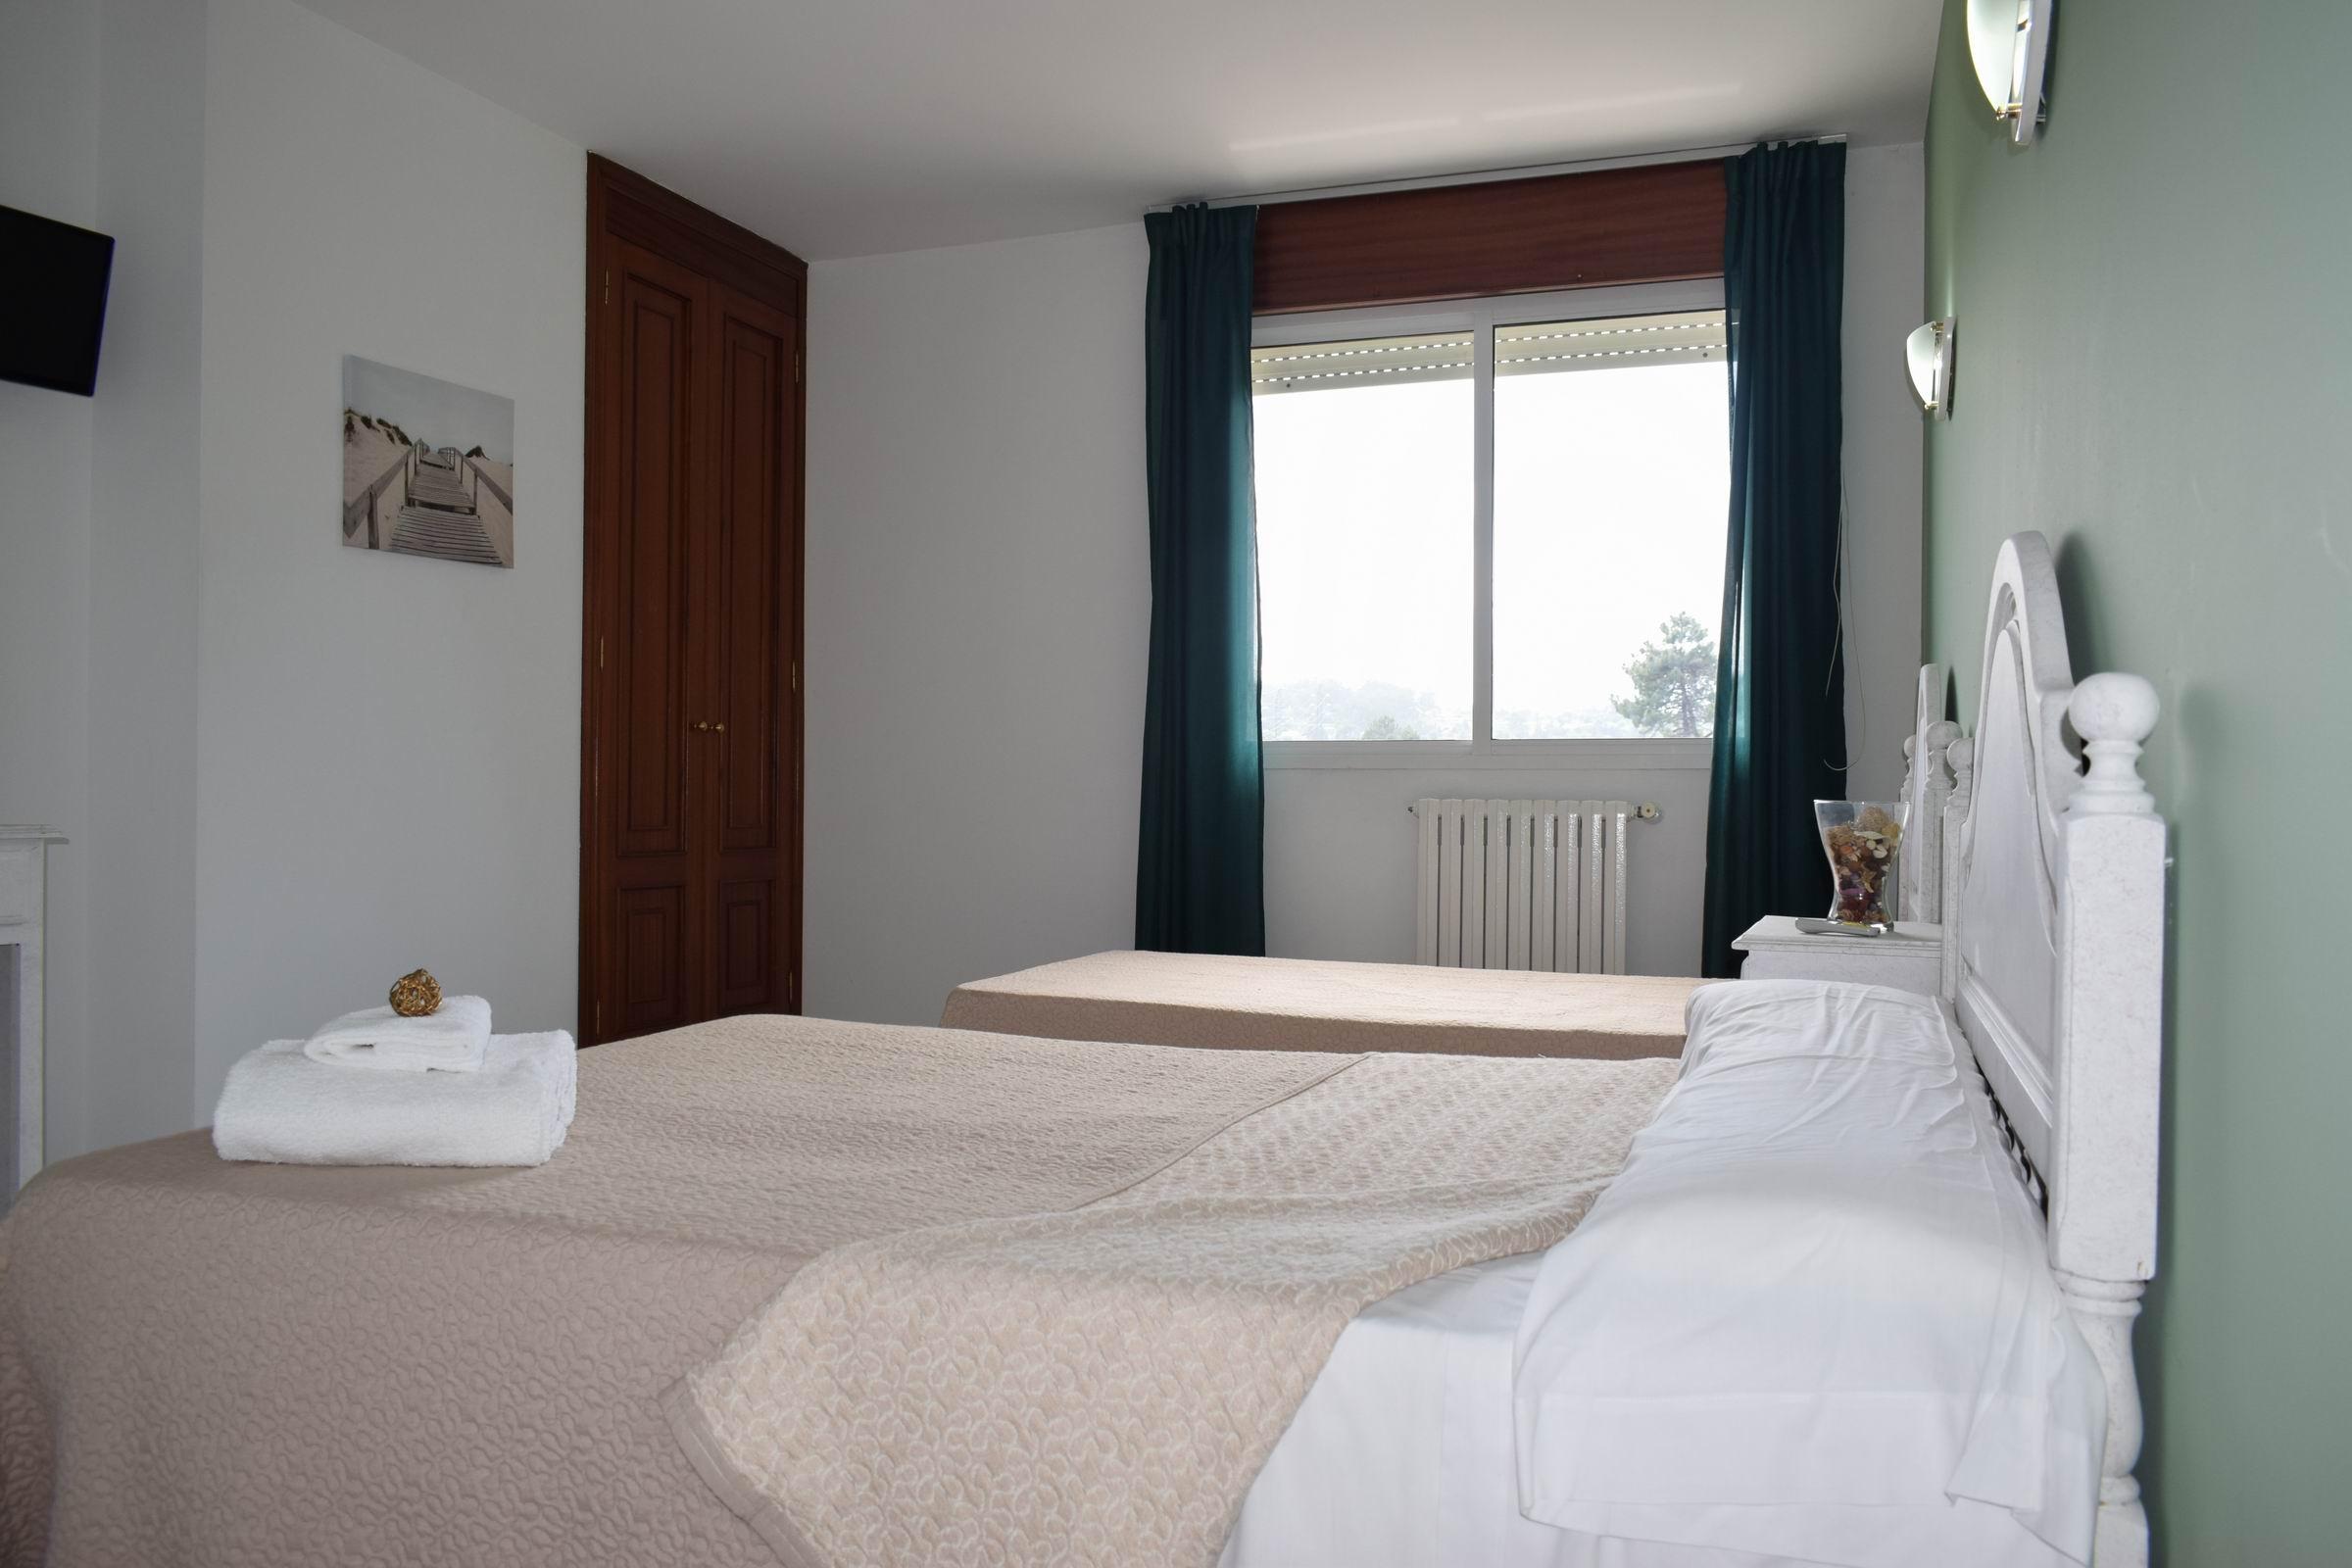 Hotel VIDA Xunca Blanca  -  11 Hab Triple 1